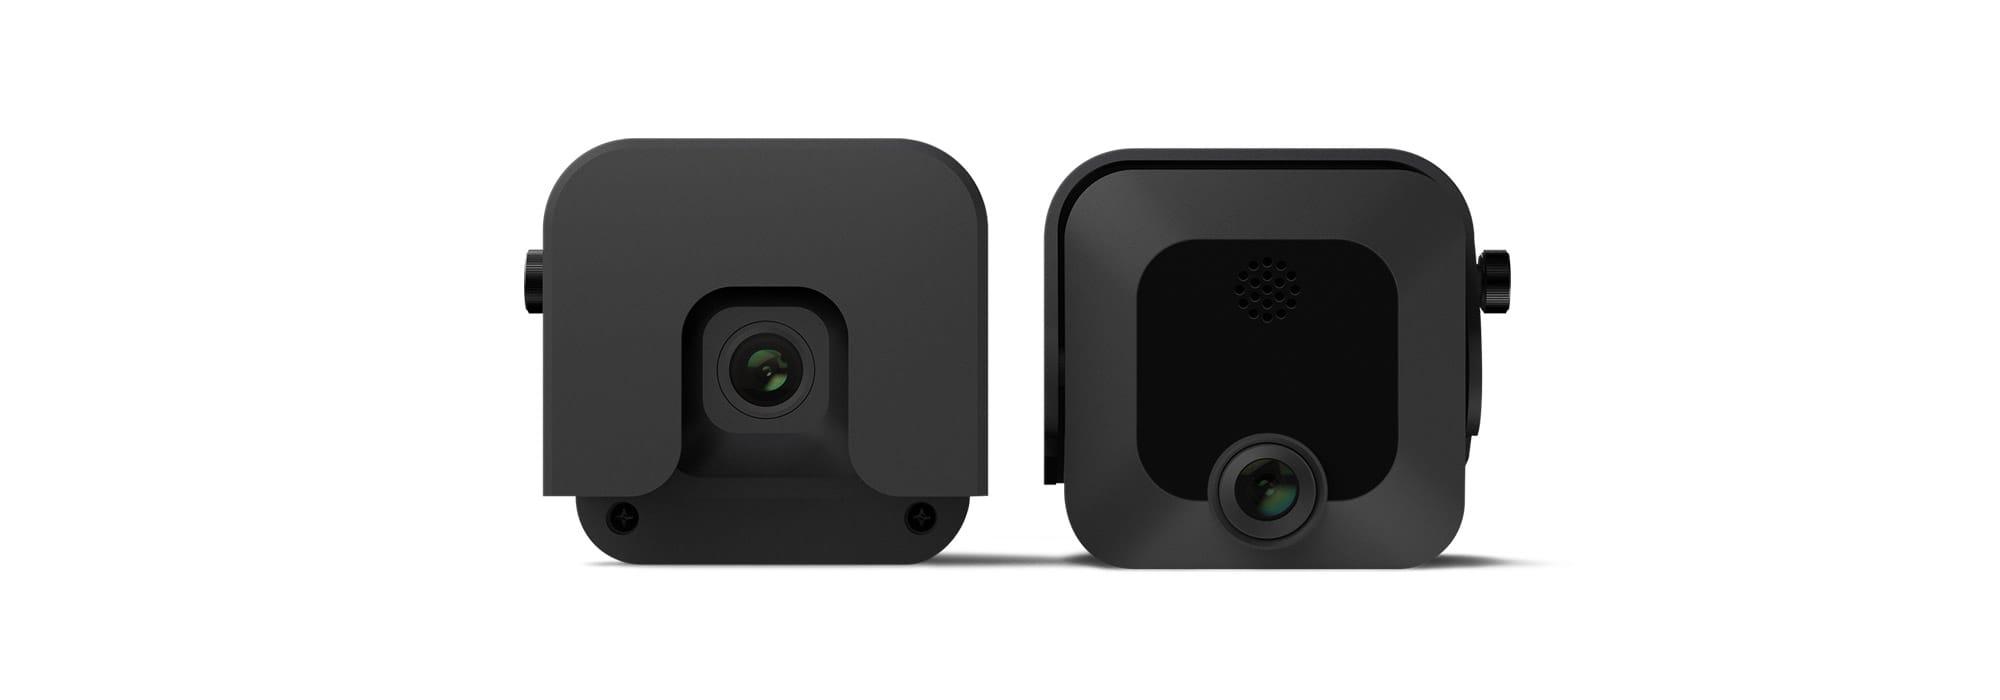 Announcing Next-Gen Dash Cams, Including Dual-Facing CM22